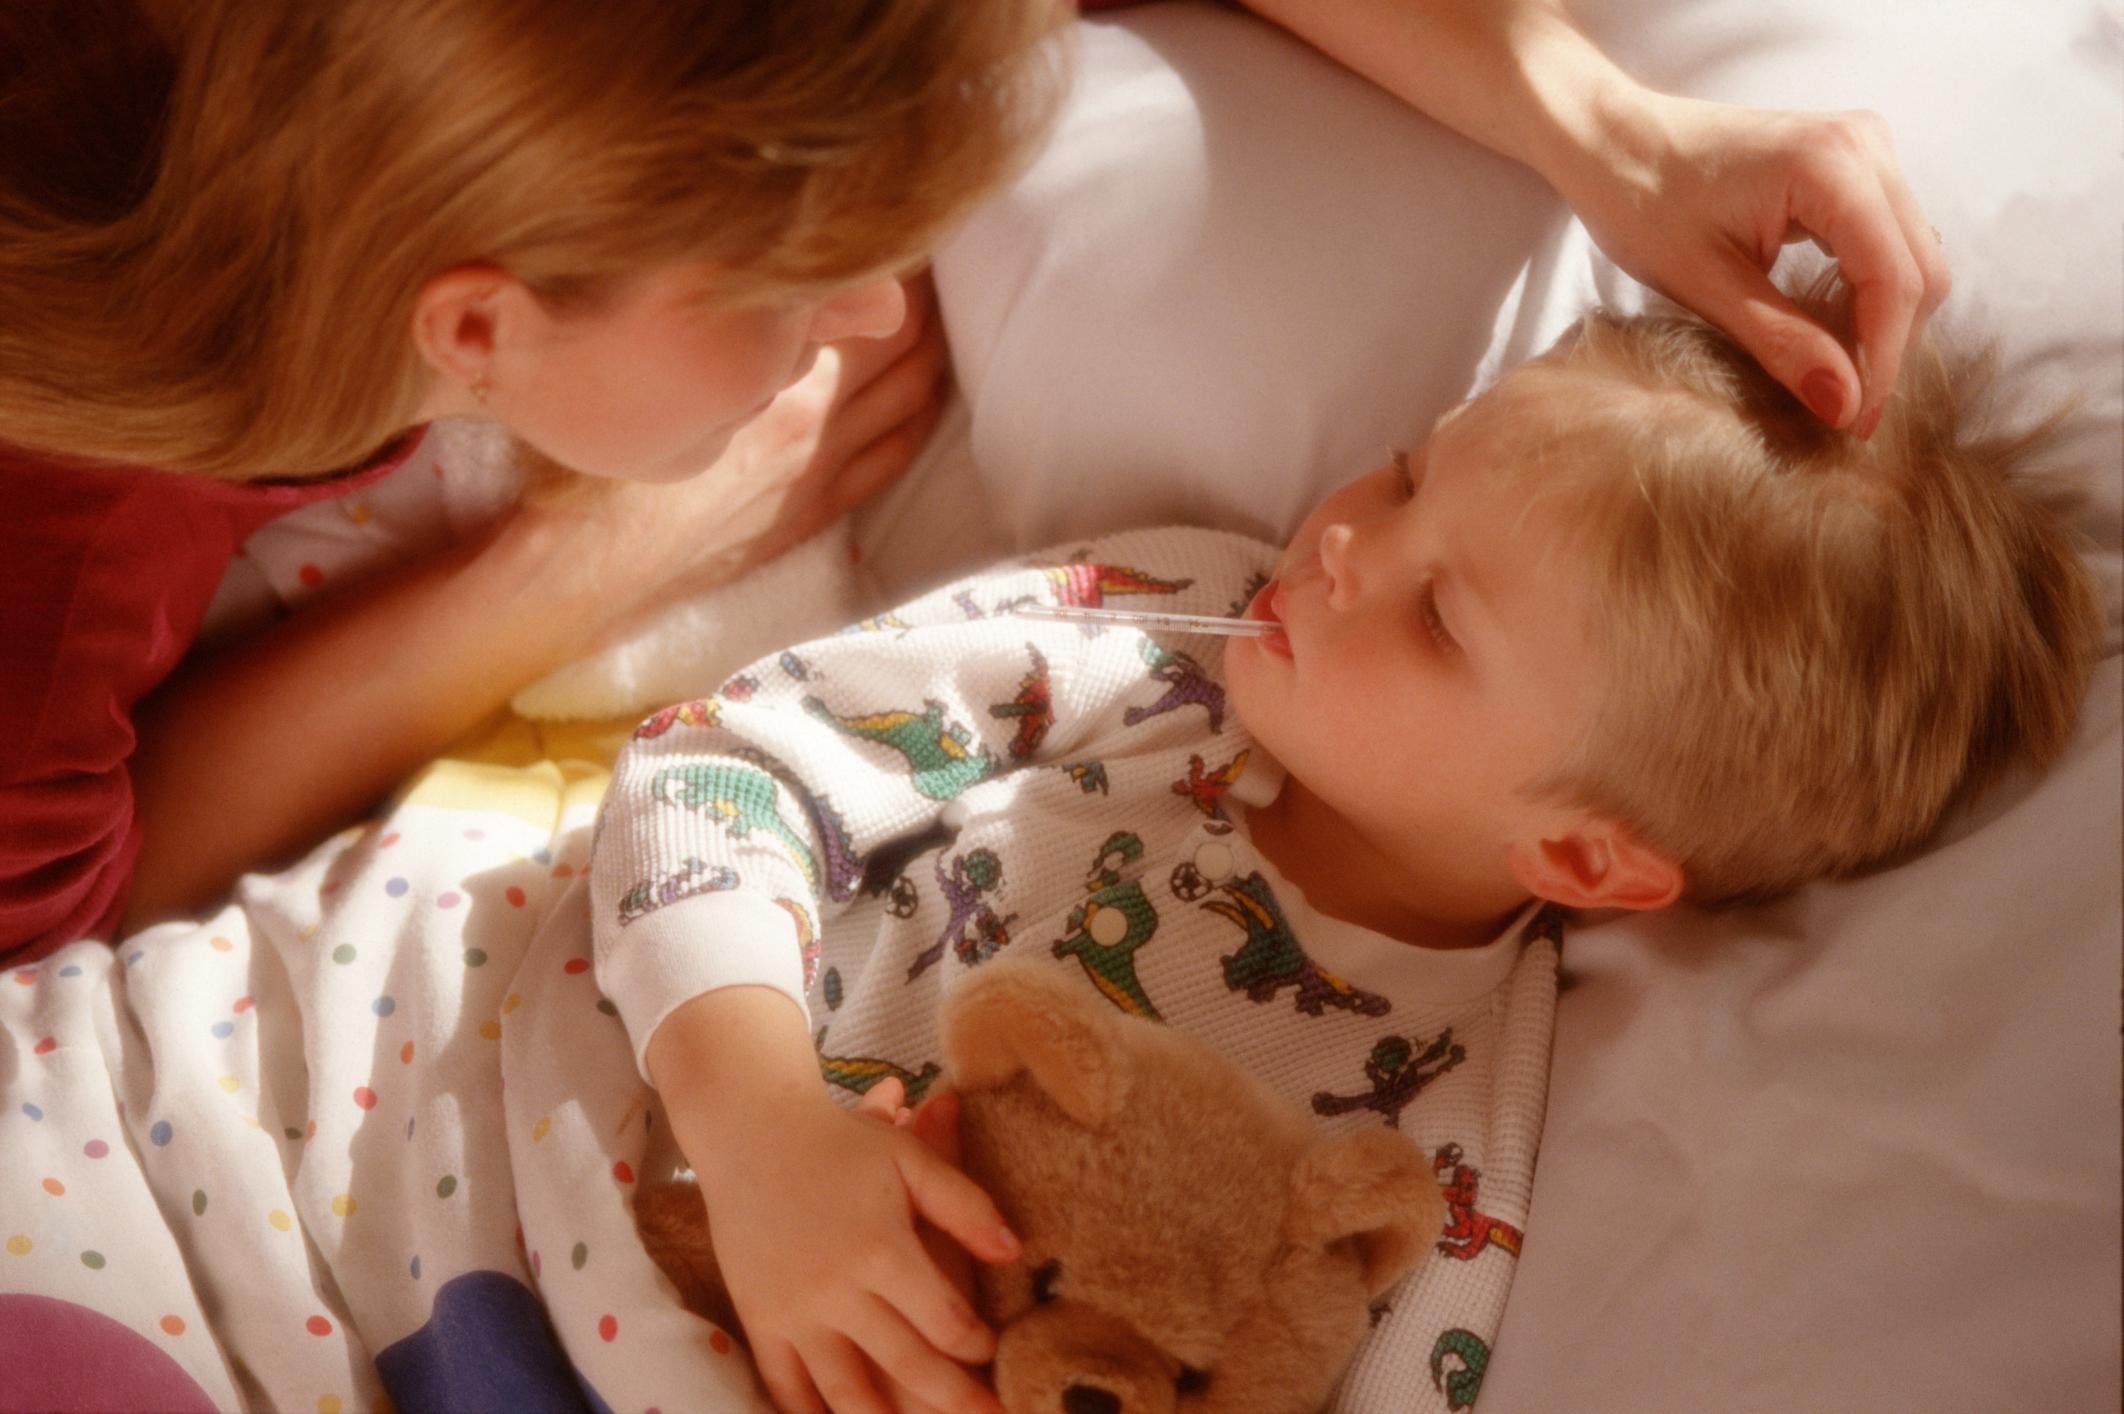 Mononucleosis in children: how to treat